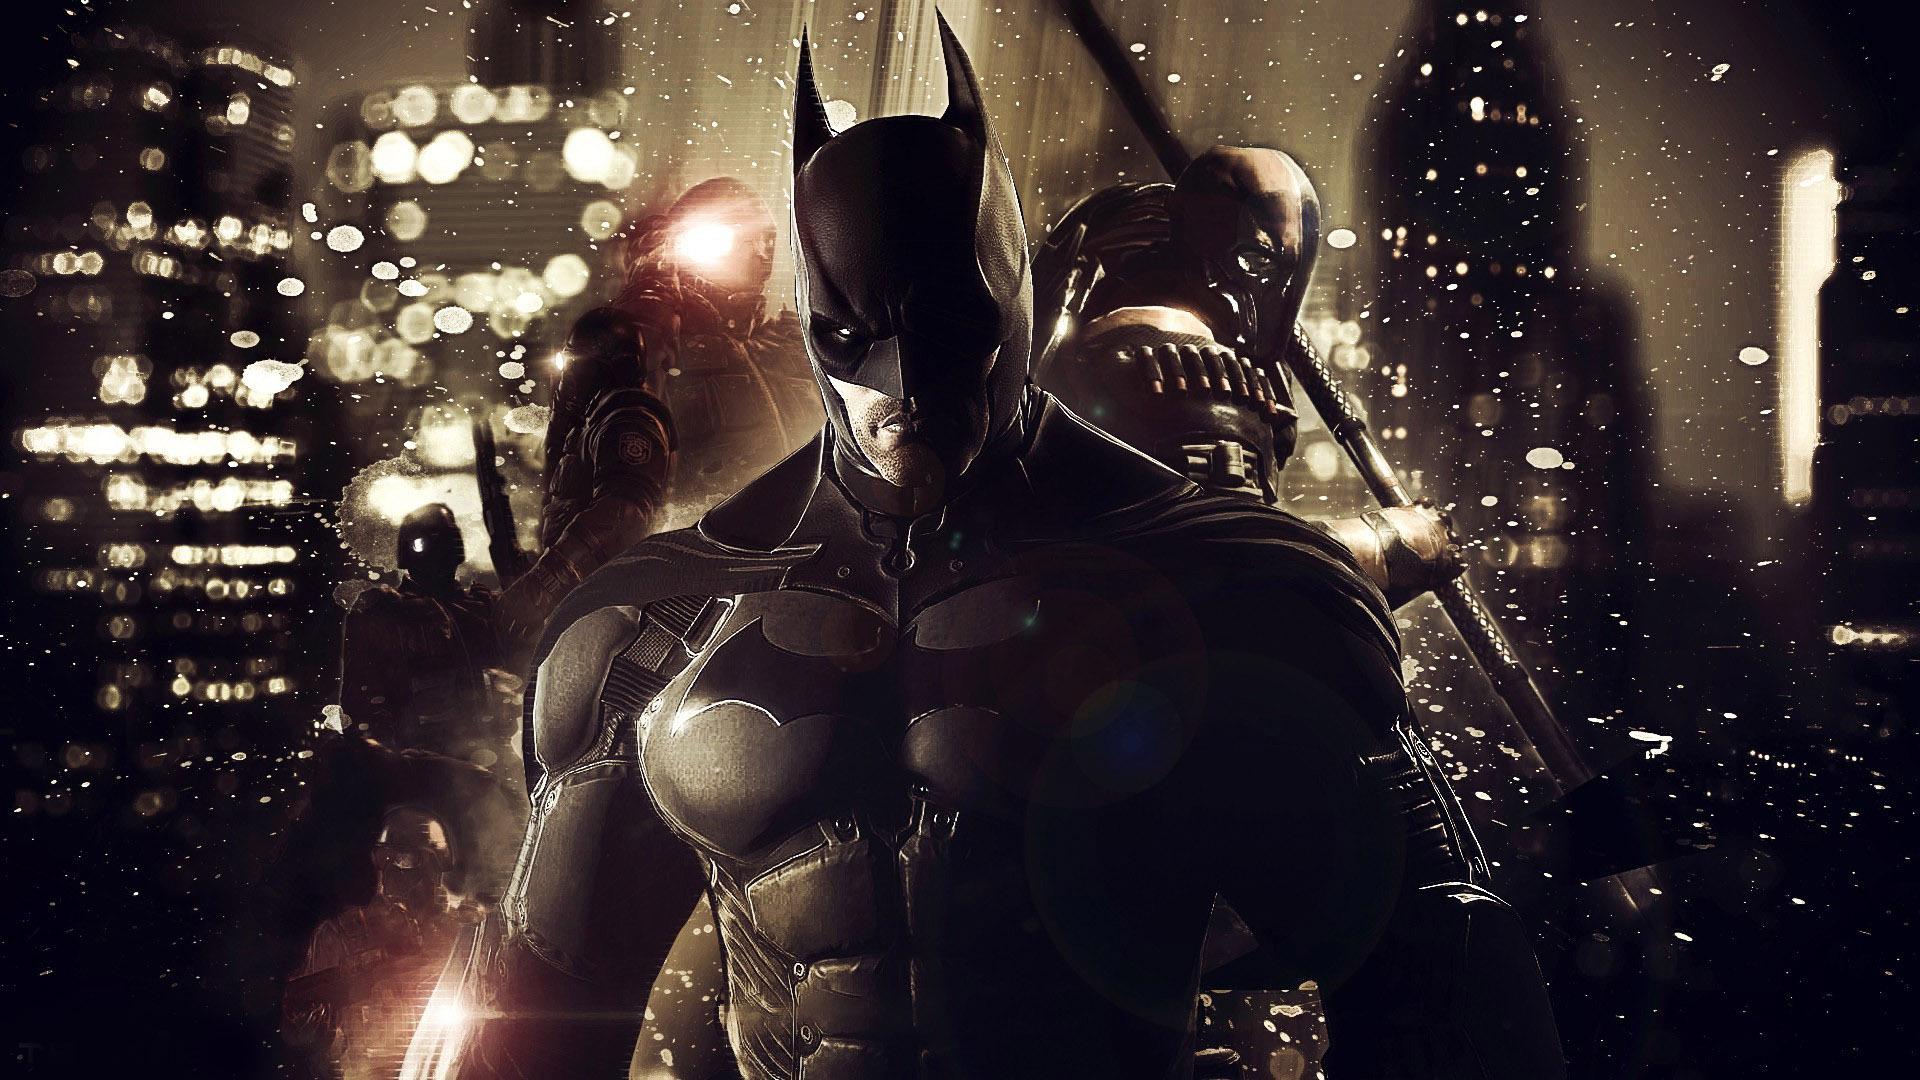 batman-digital-art-hd-wallpaper-1920x1080-2119